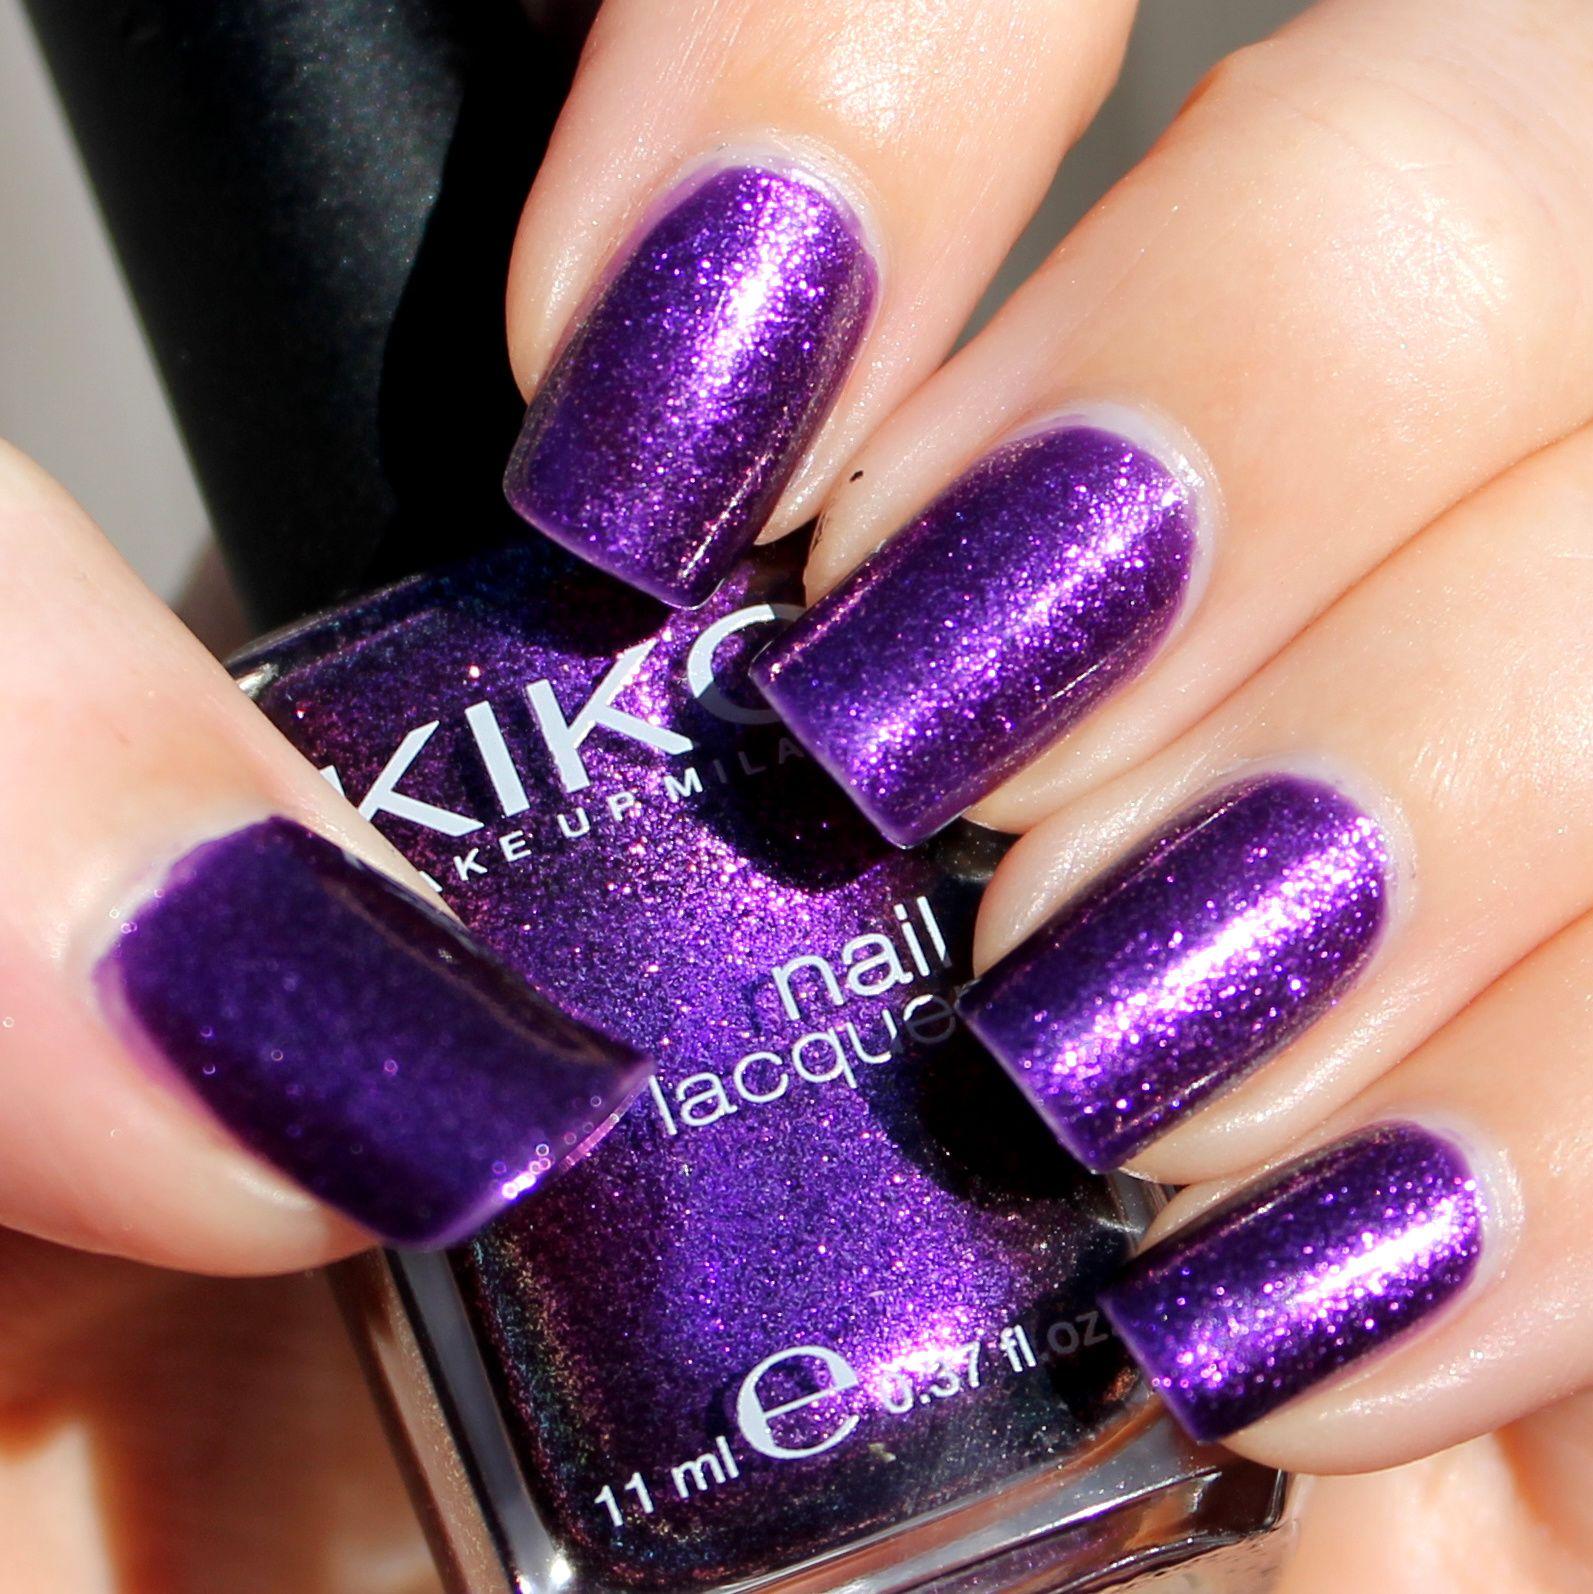 Duri Cosmetics Rejuvacote / Kiko Violet Orchid Microglitter / Poshe Top Coat